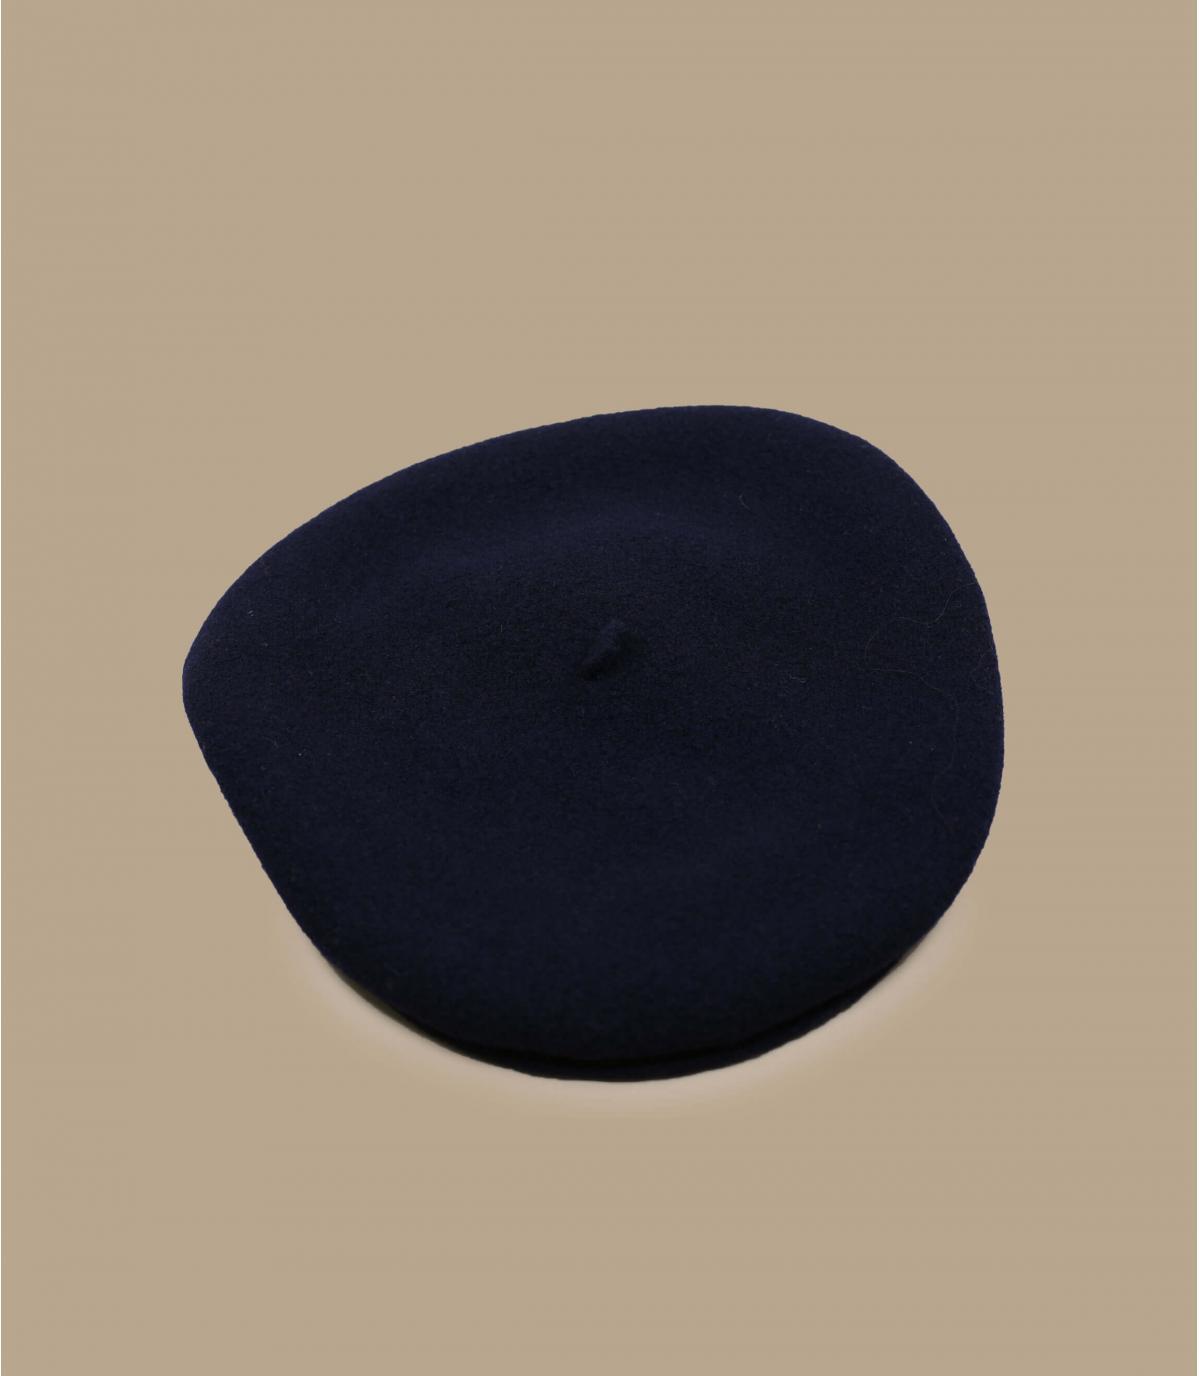 Details Flatcap 1840 marineblau - Abbildung 2